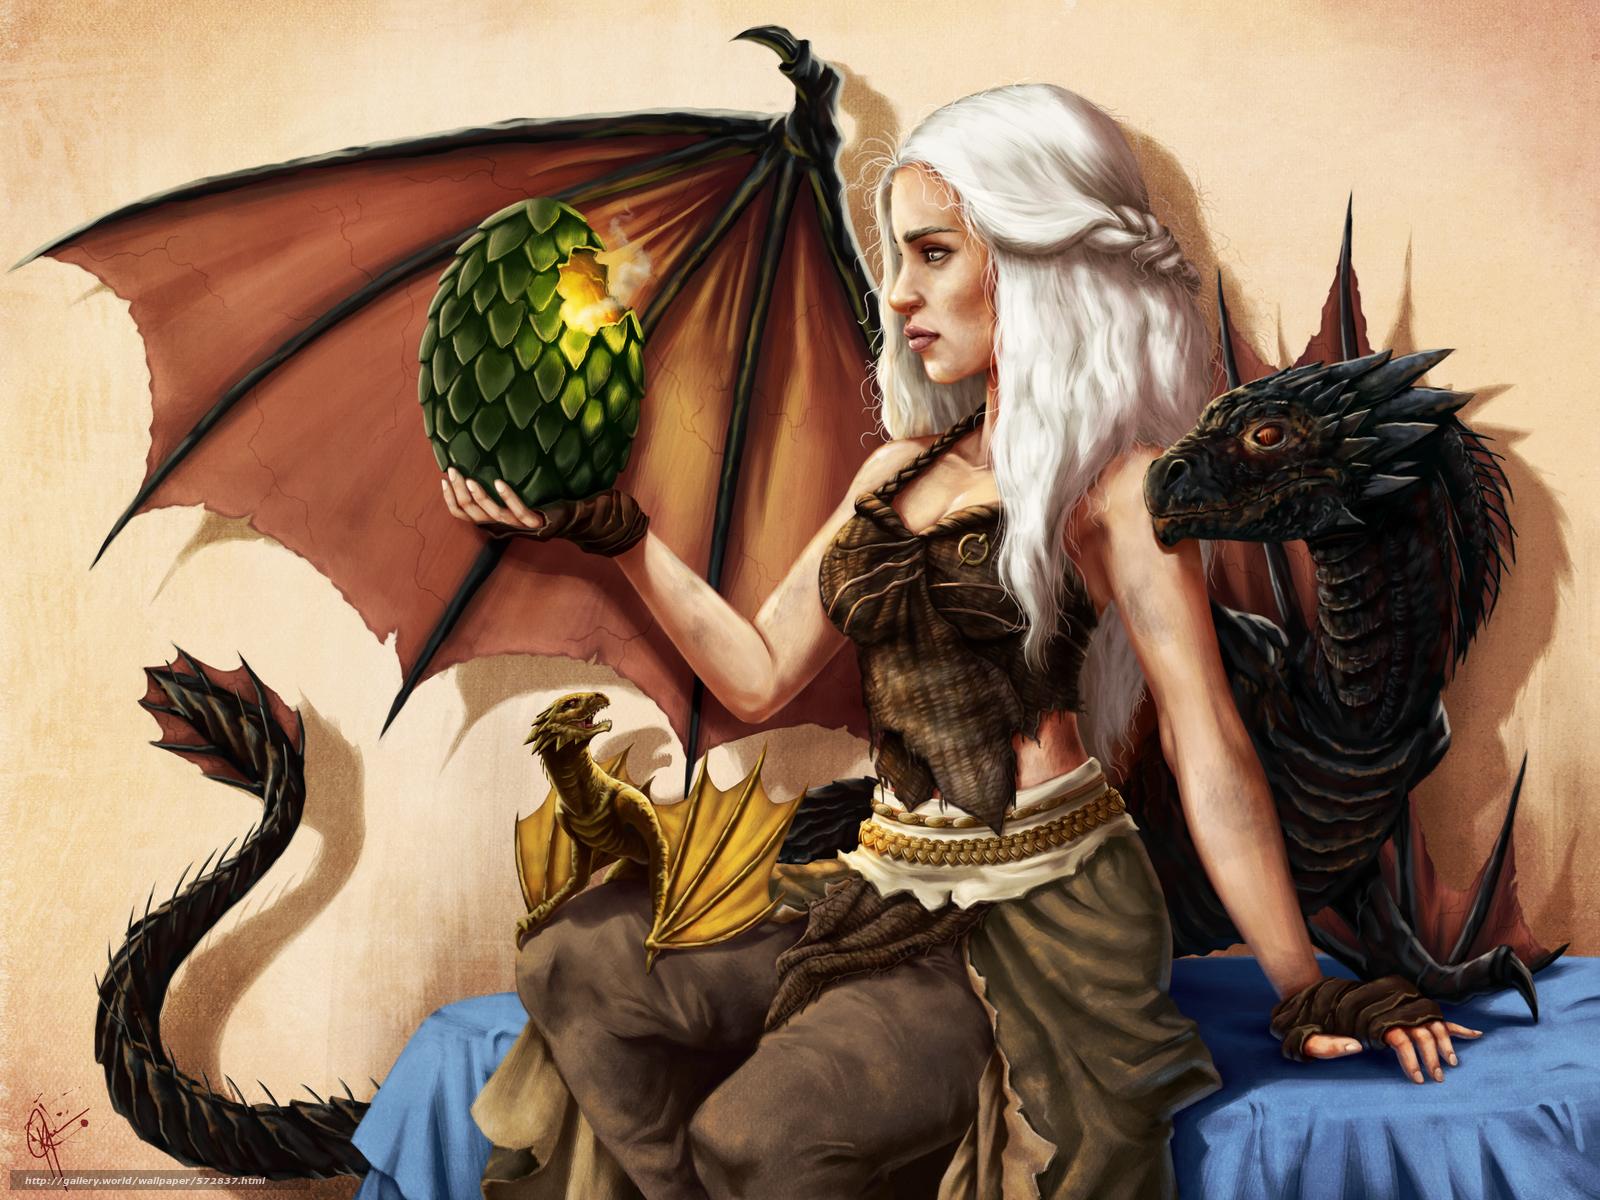 Dragon sextoon naked clip